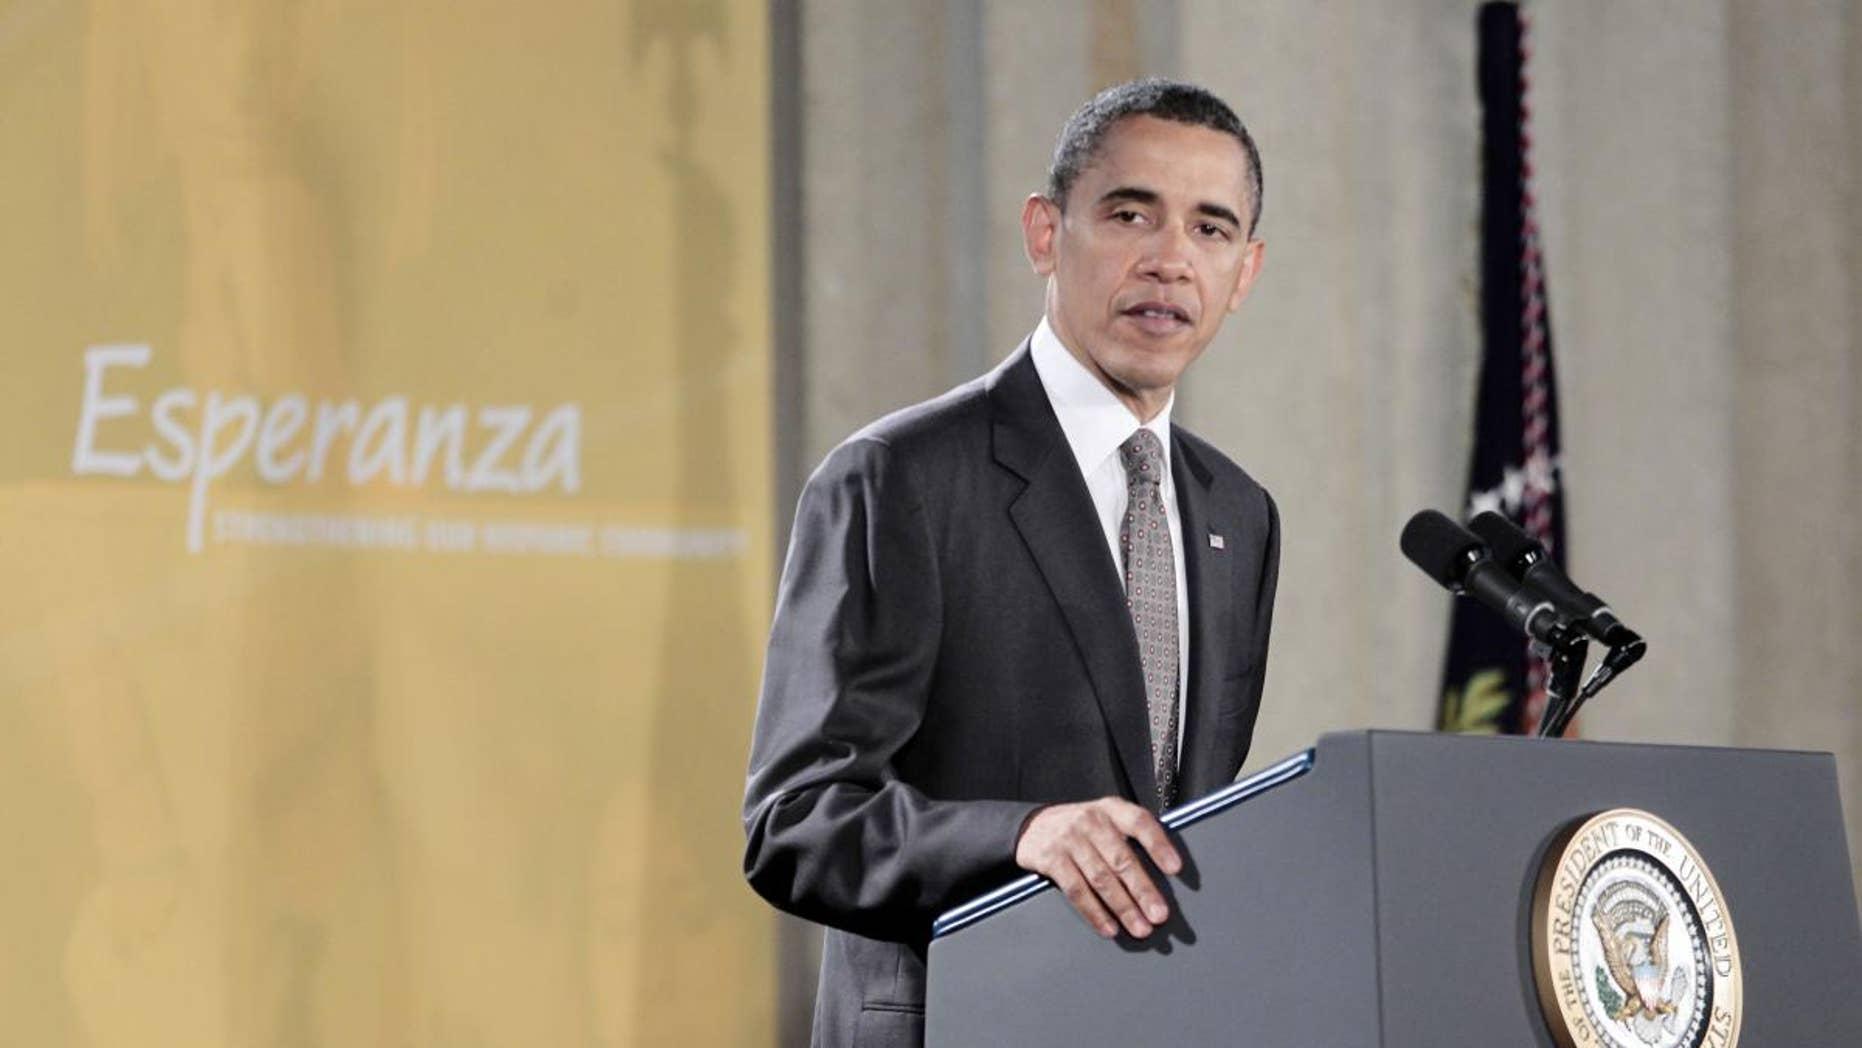 President Barack Obama delivers remarks at the National Hispanic Prayer Breakfast at the Mellon Auditorium in Washington, Thursday, May 12, 2011. (AP Photo/Pablo Martinez Monsivais)